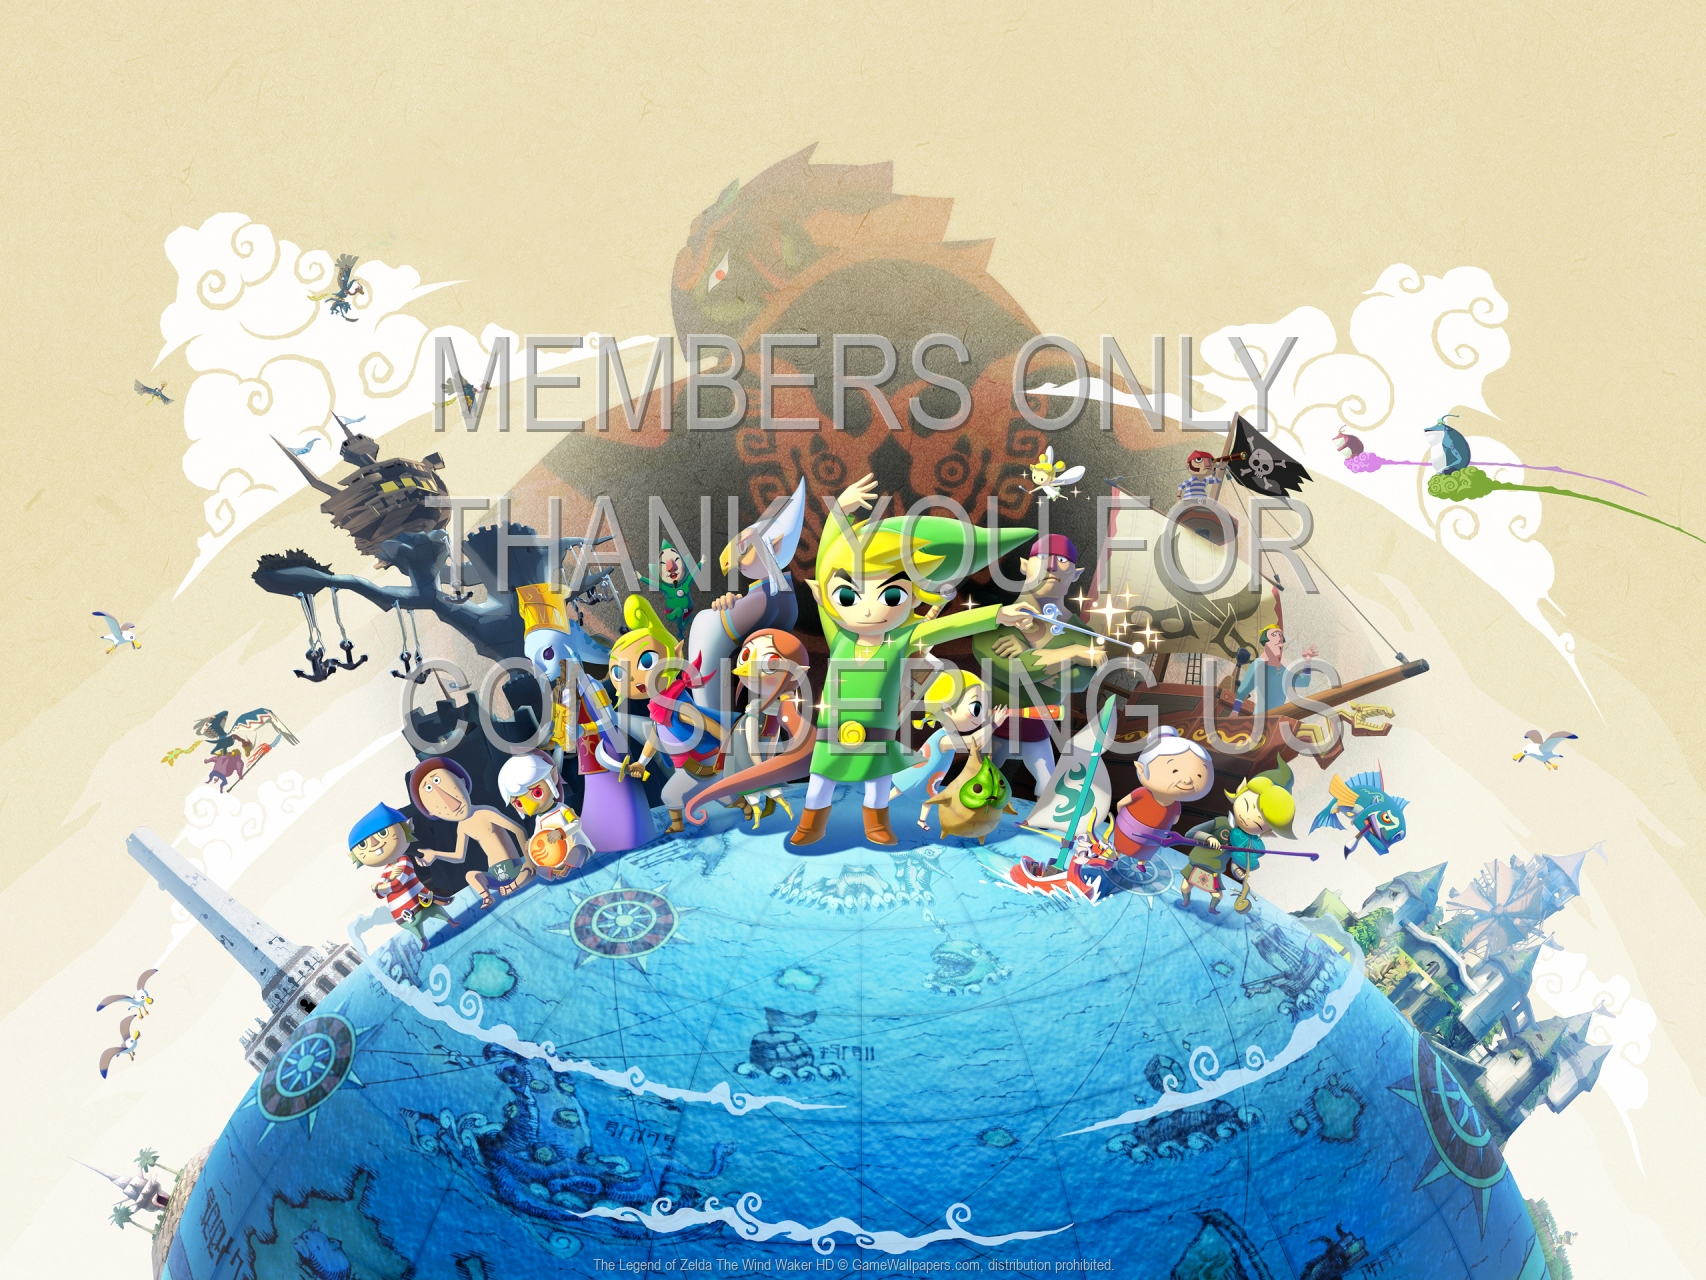 The Legend of Zelda: The Wind Waker HD 1920x1080 Mobiele achtergrond 01